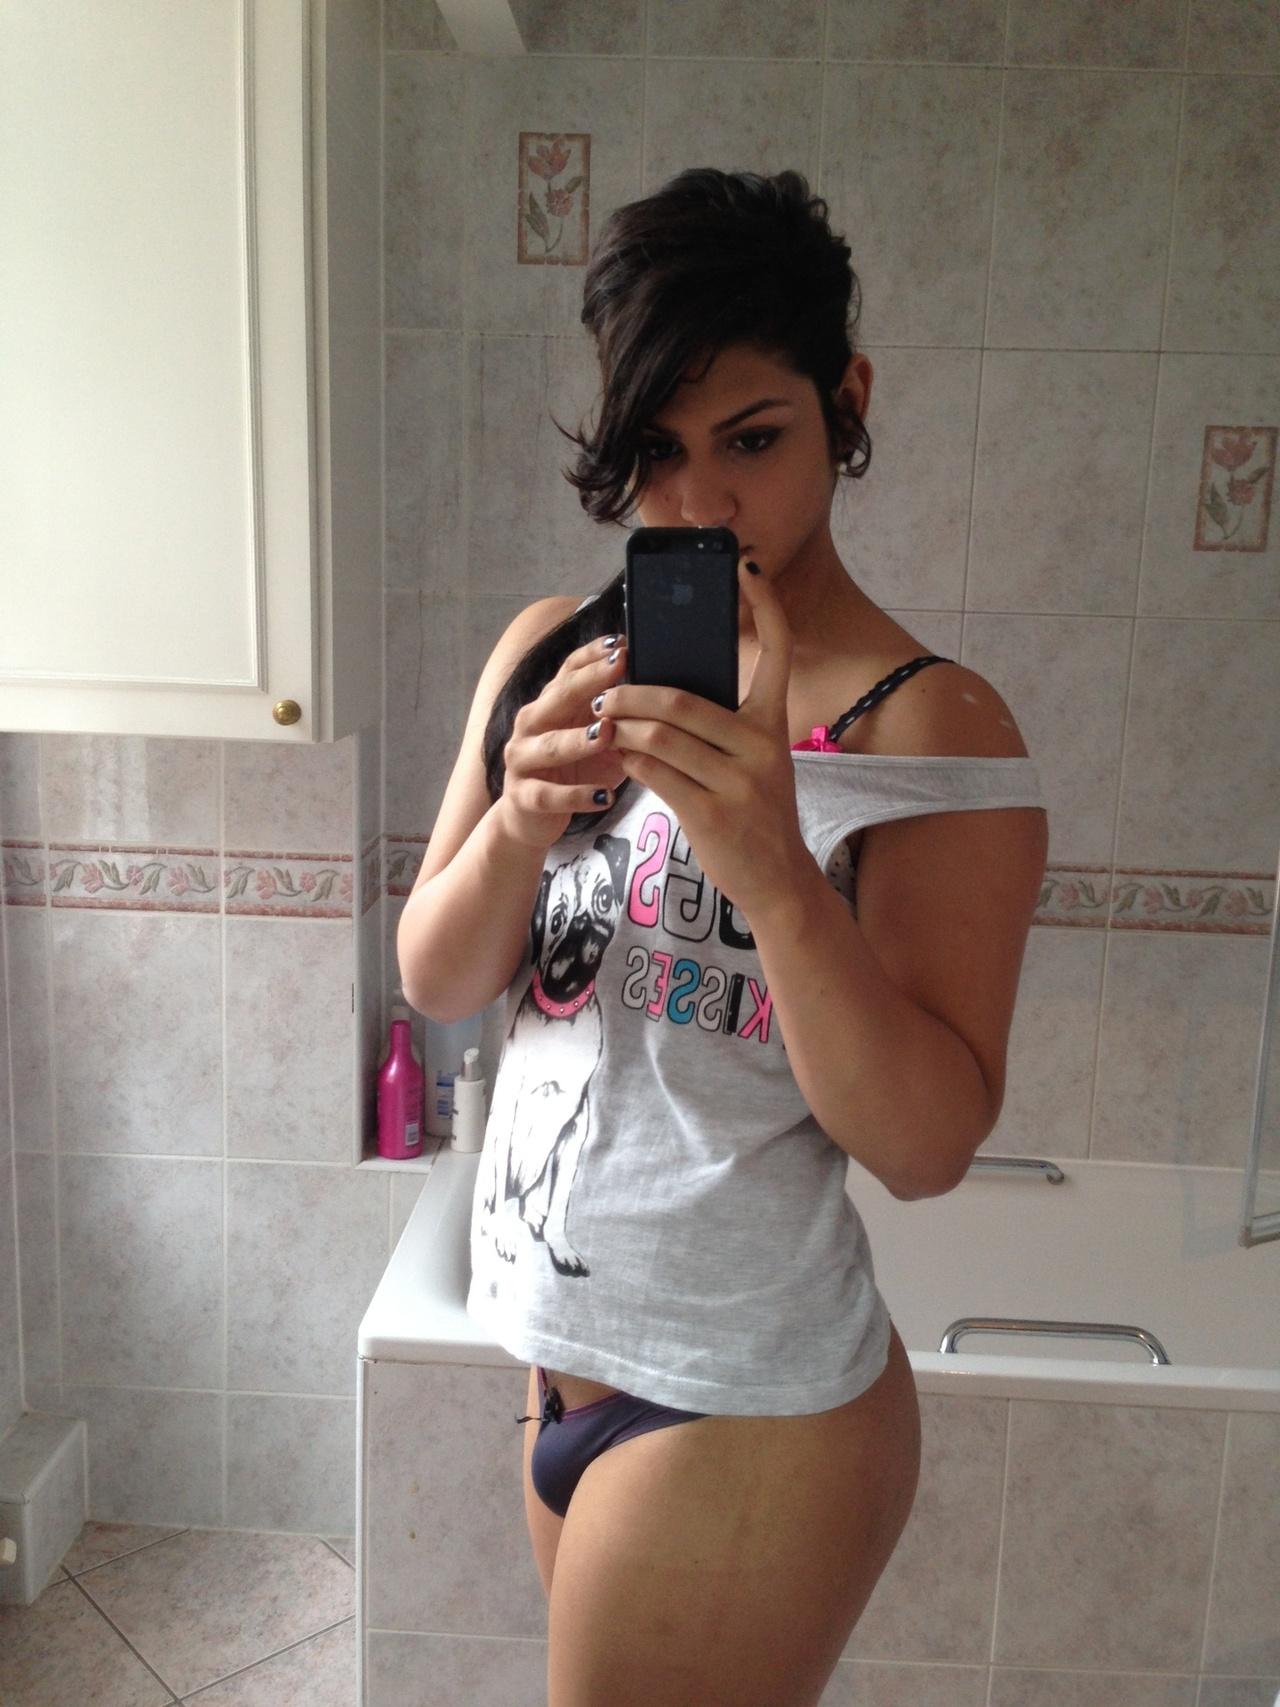 busty rihanna look a like cassidy banks gets creampied bnc #femboy  #trap  #brunette  #teen  #selfshot  #amateur  #homemade  #nn  #nonnude